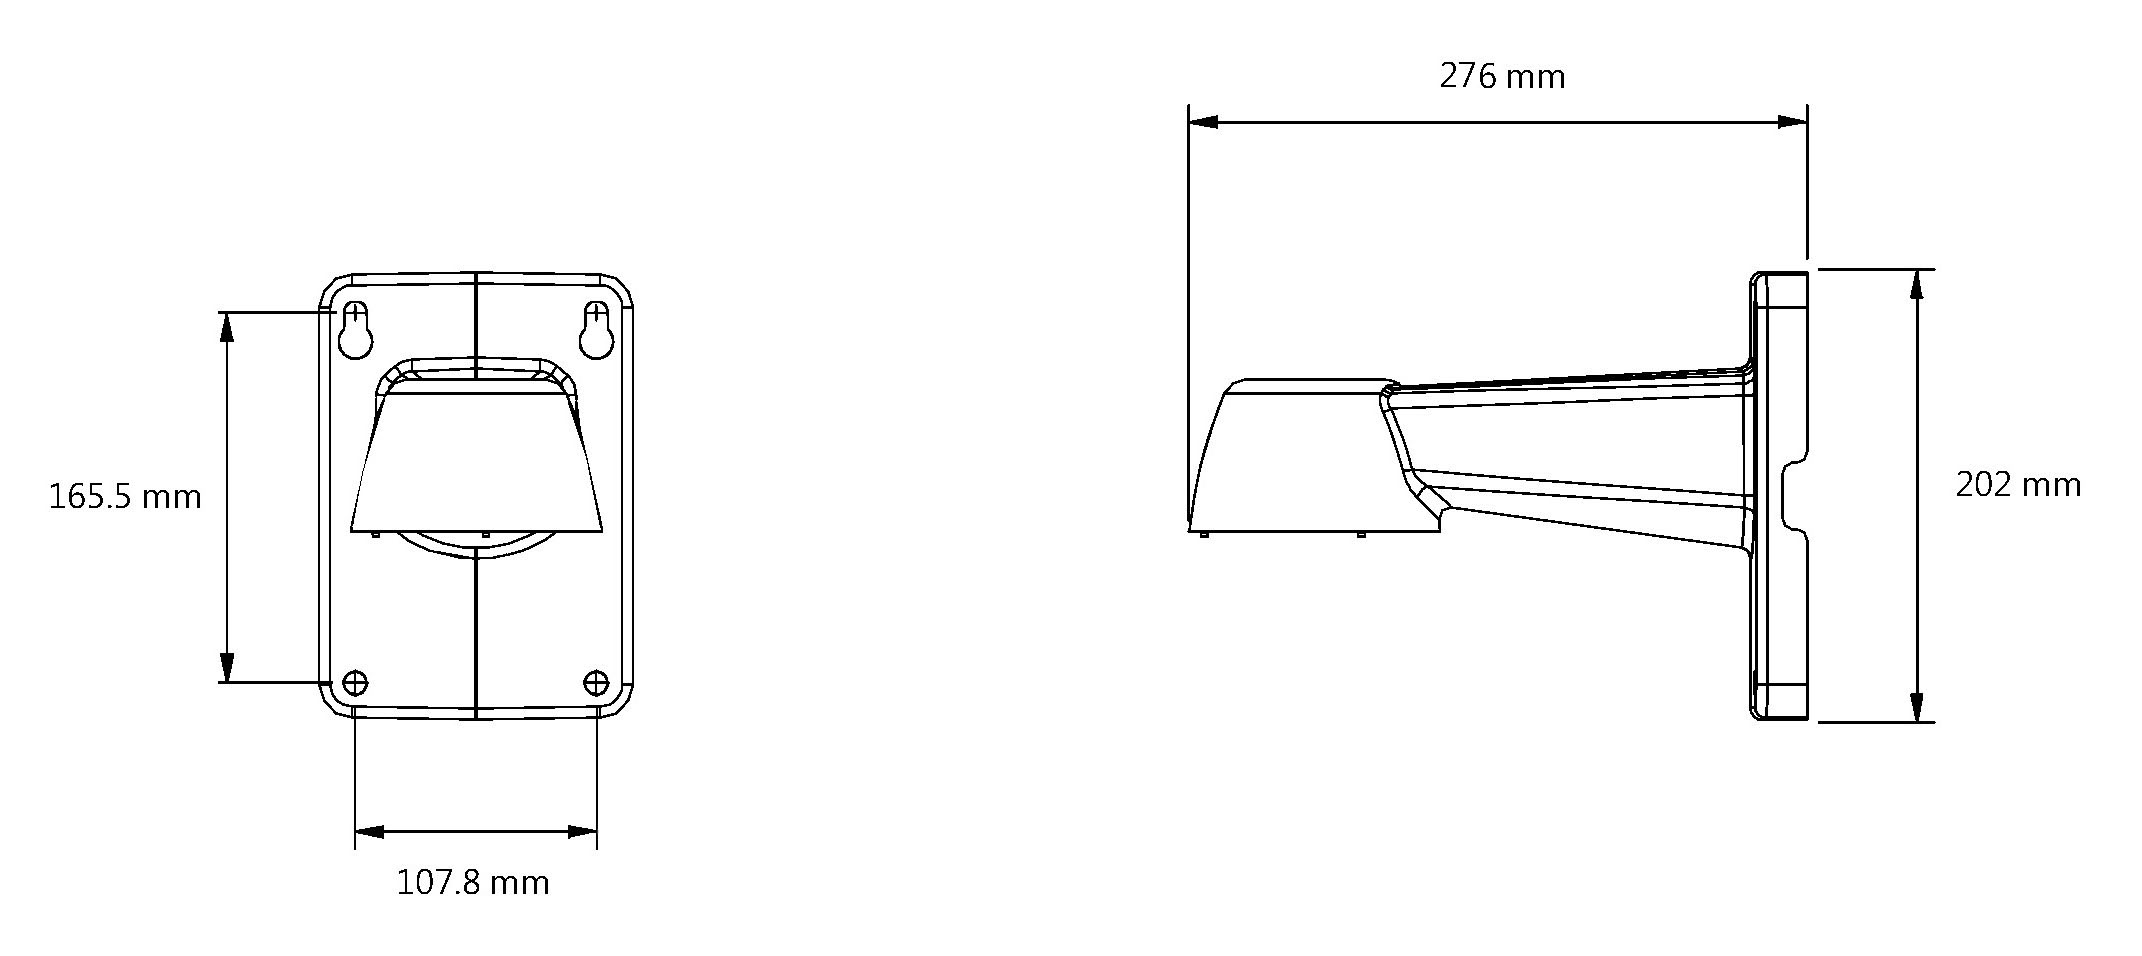 AM-21C Dimensions